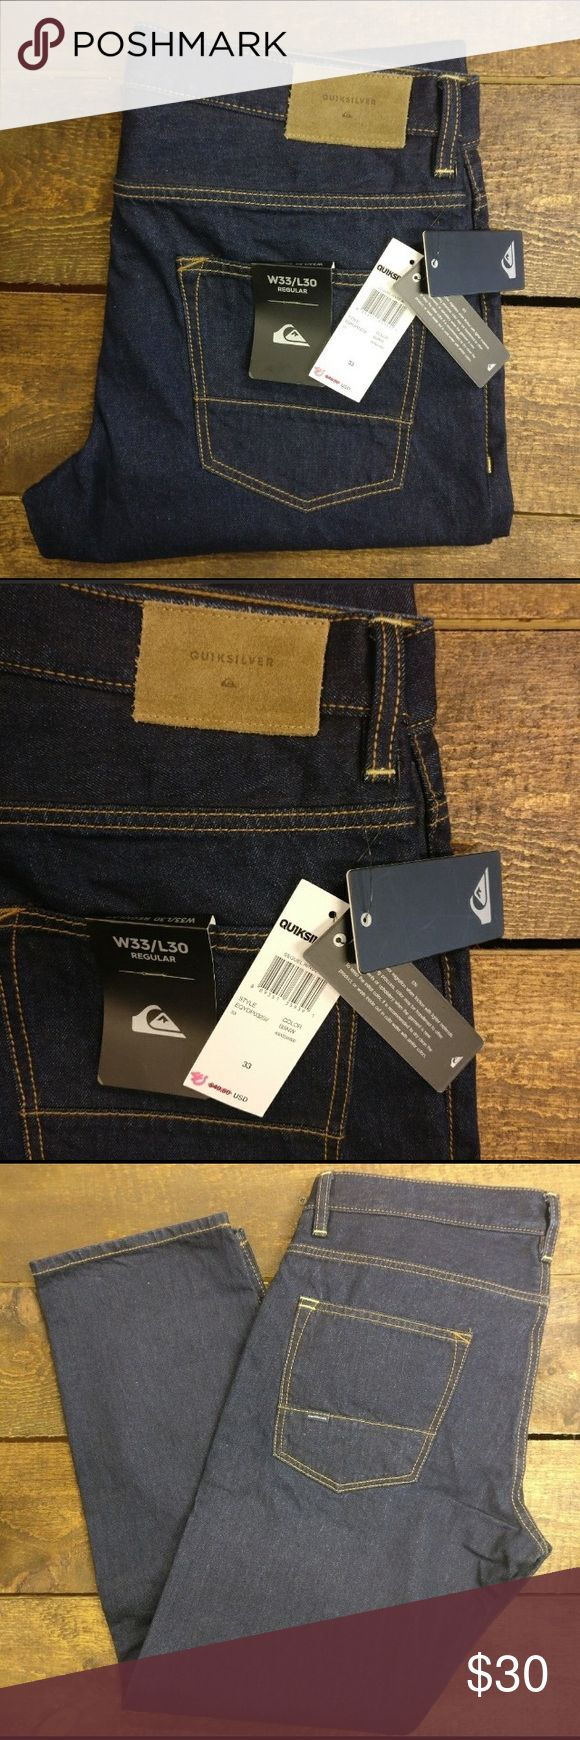 "Quiksilver regular fit men's denim • 11.5oz medium weight denim material  • 30"" inseam  • 5 pocket design  • 100% cotton  • zip up fly Quiksilver Jeans"